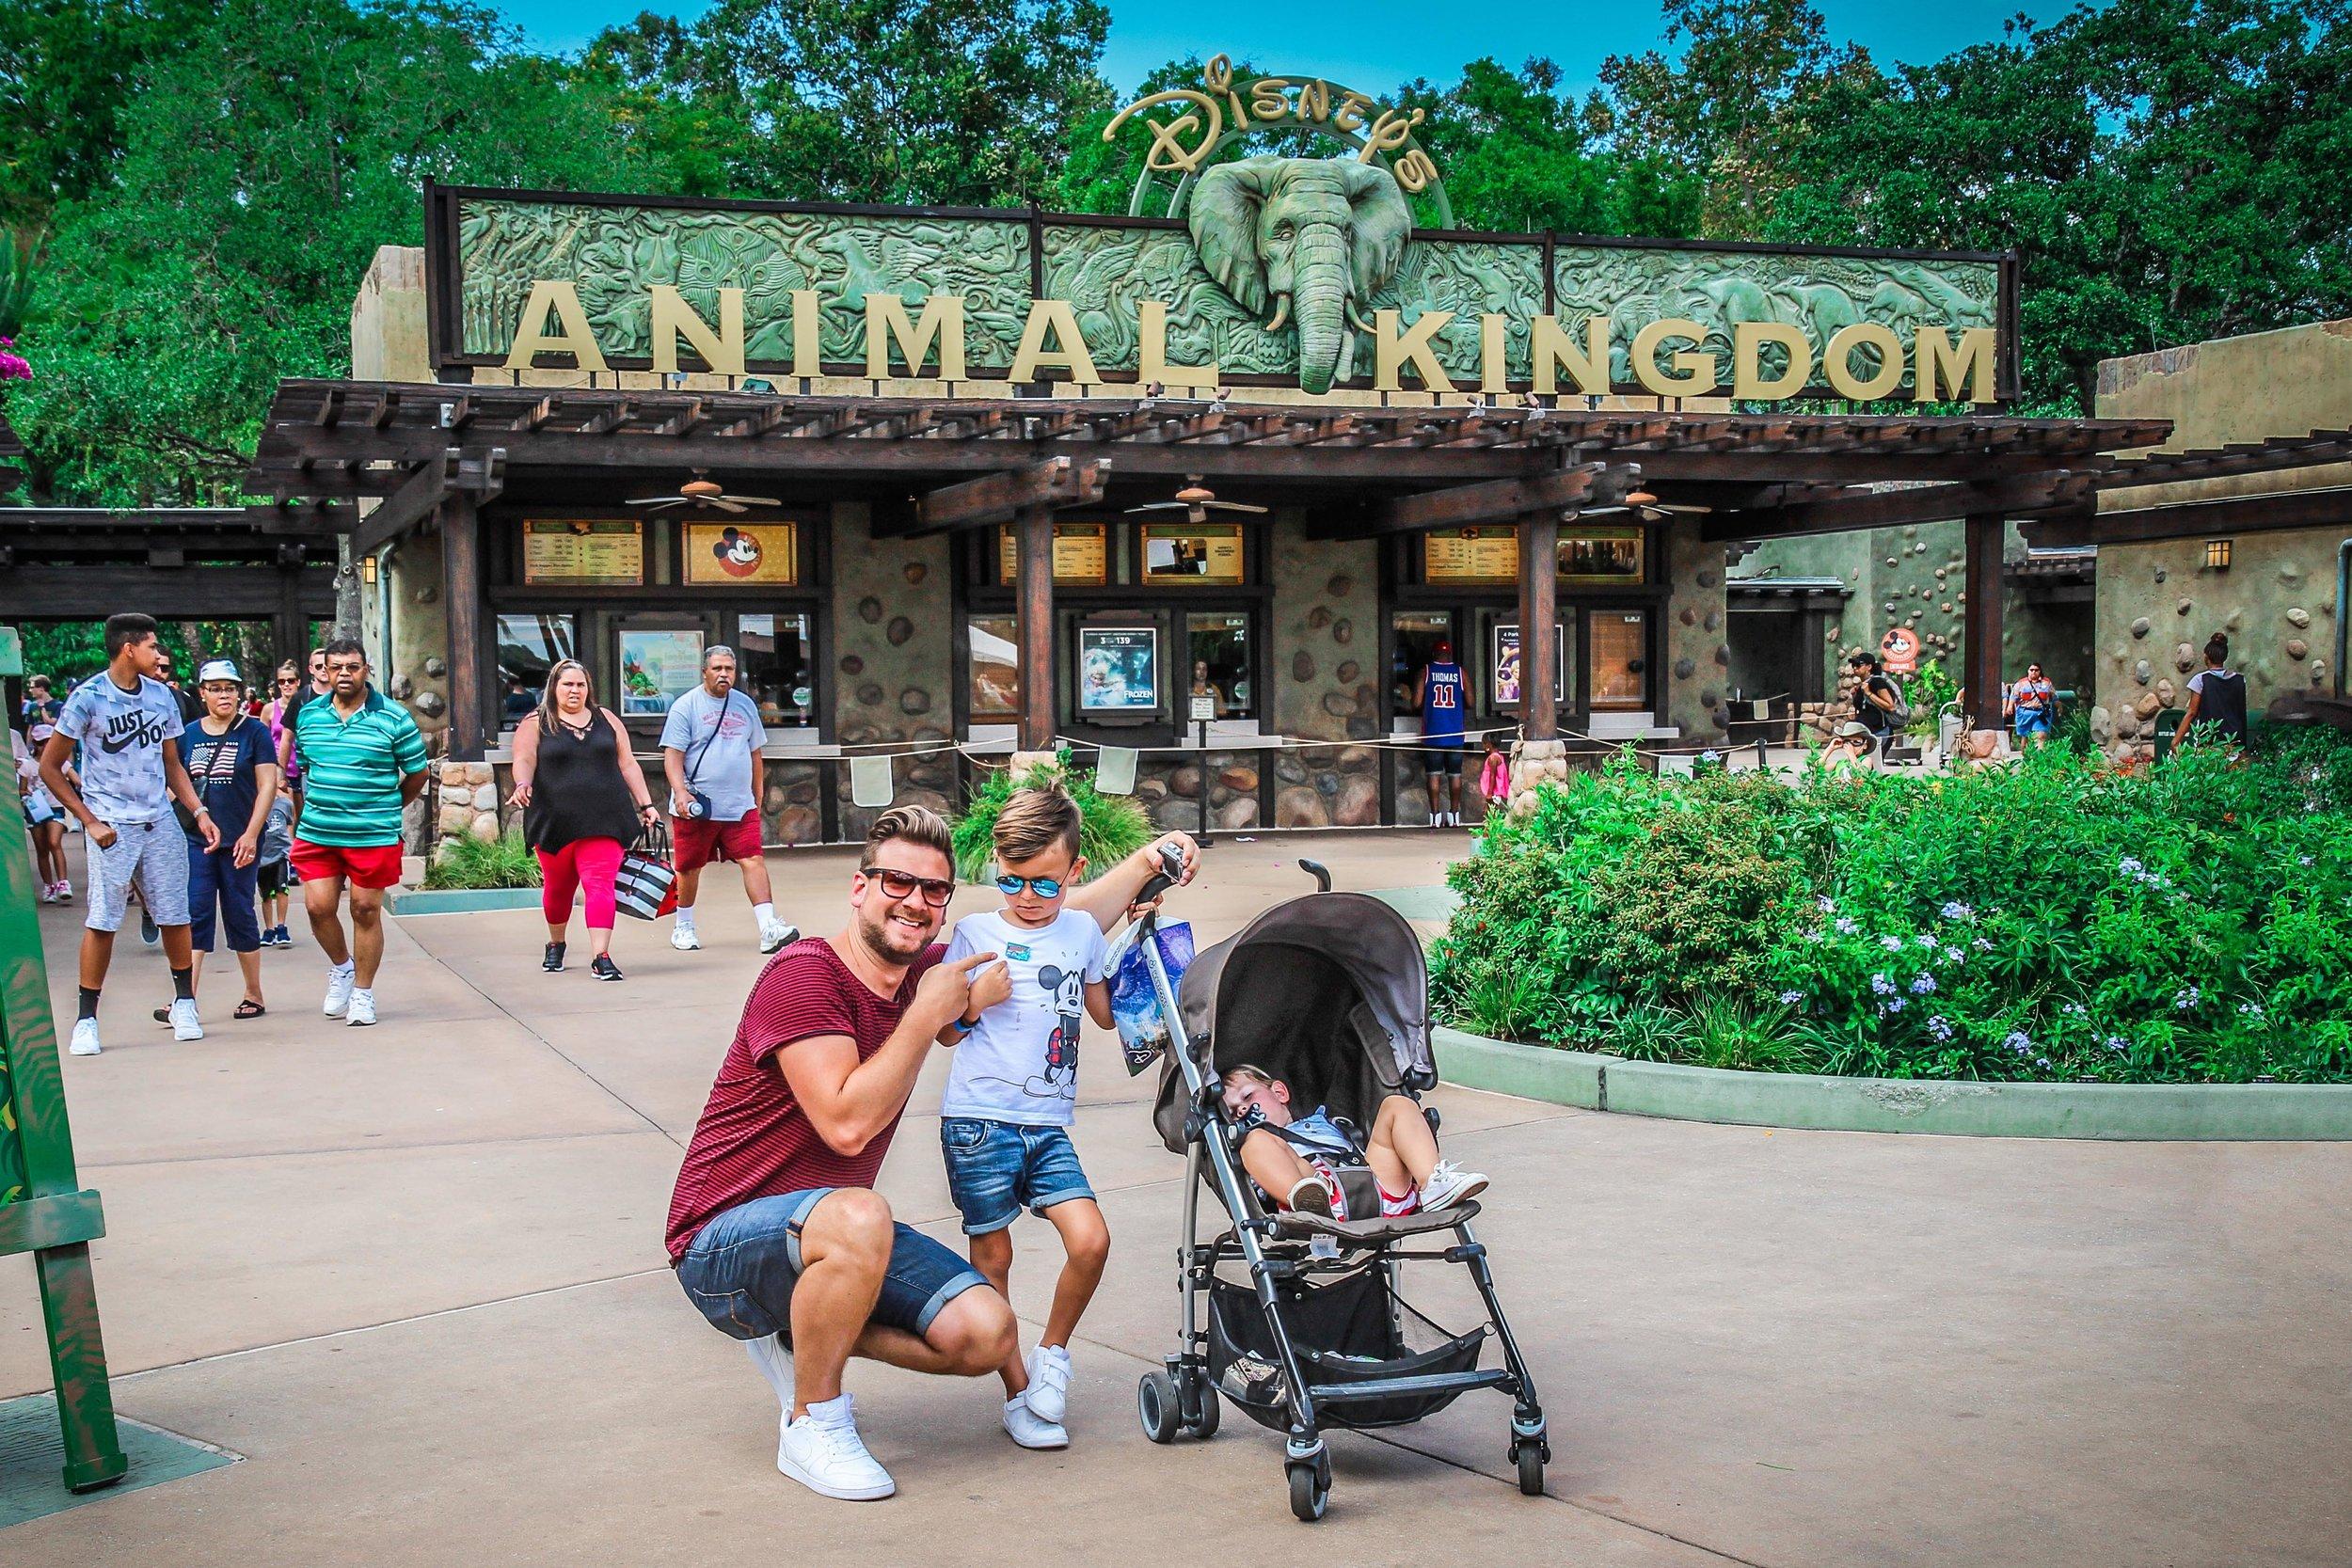 Animal_kingdom_orlando_reizen_met_kinderen-62.jpg